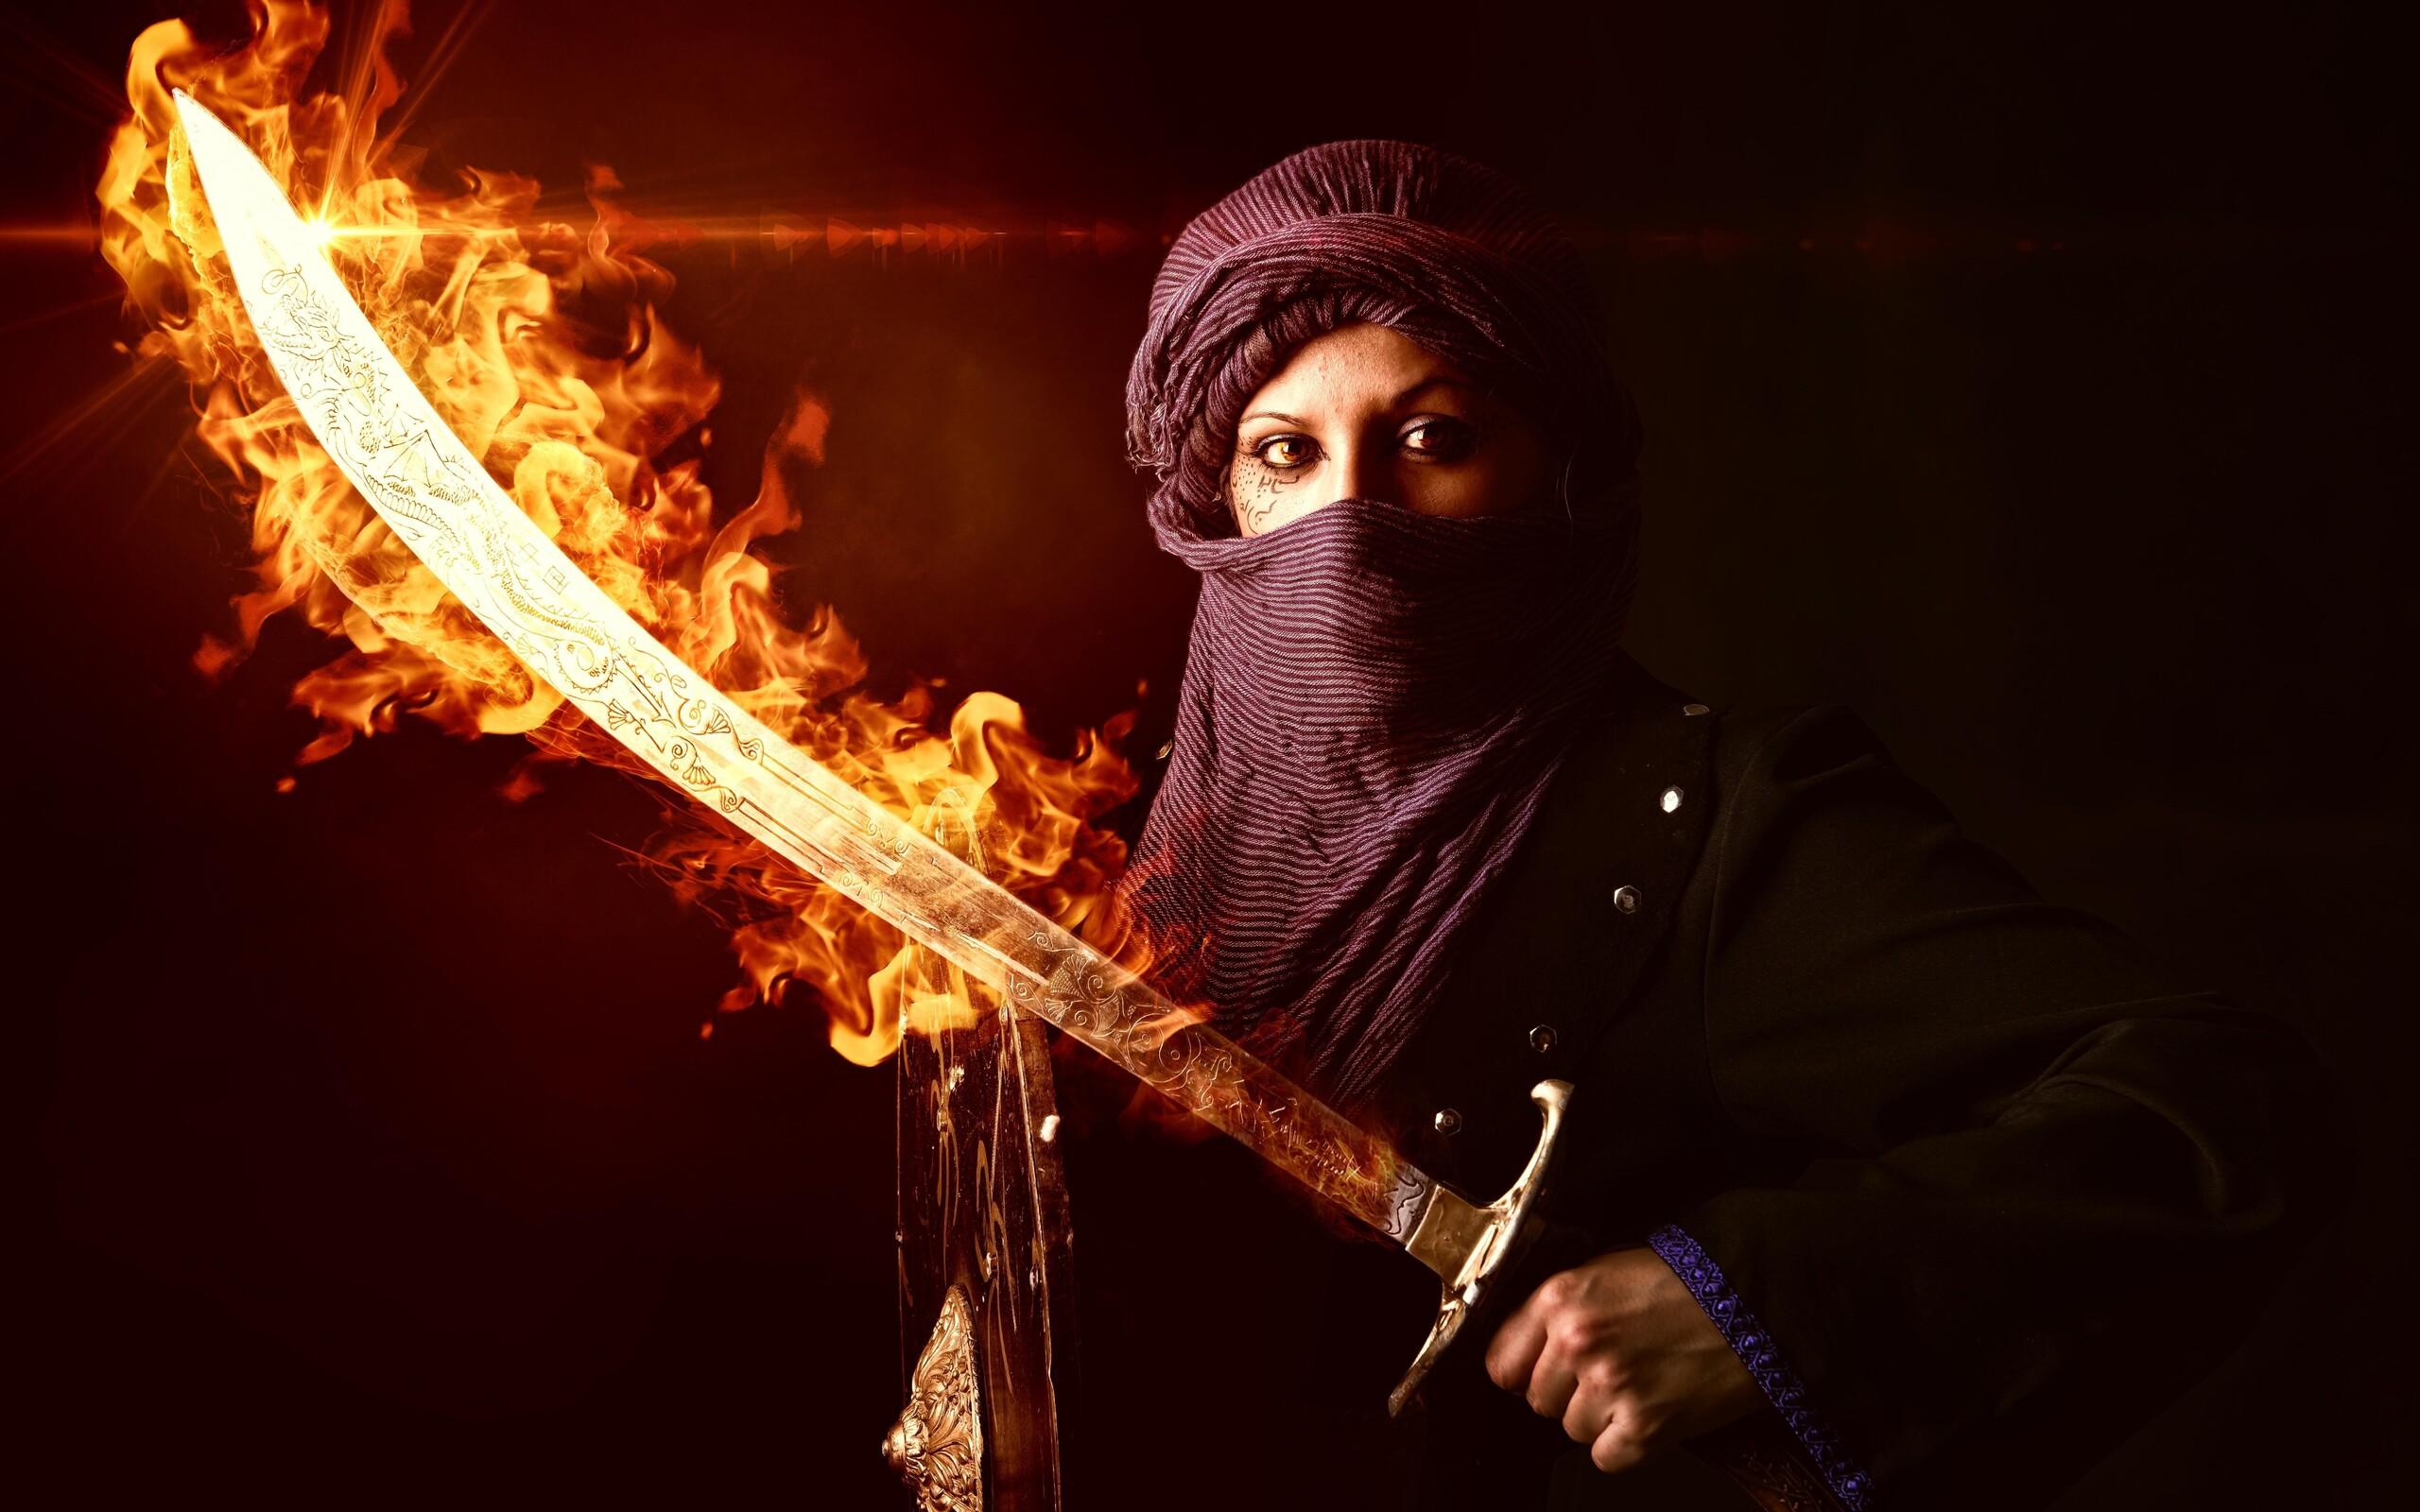 warrior-women-with-burning-sword-8k-aq.jpg